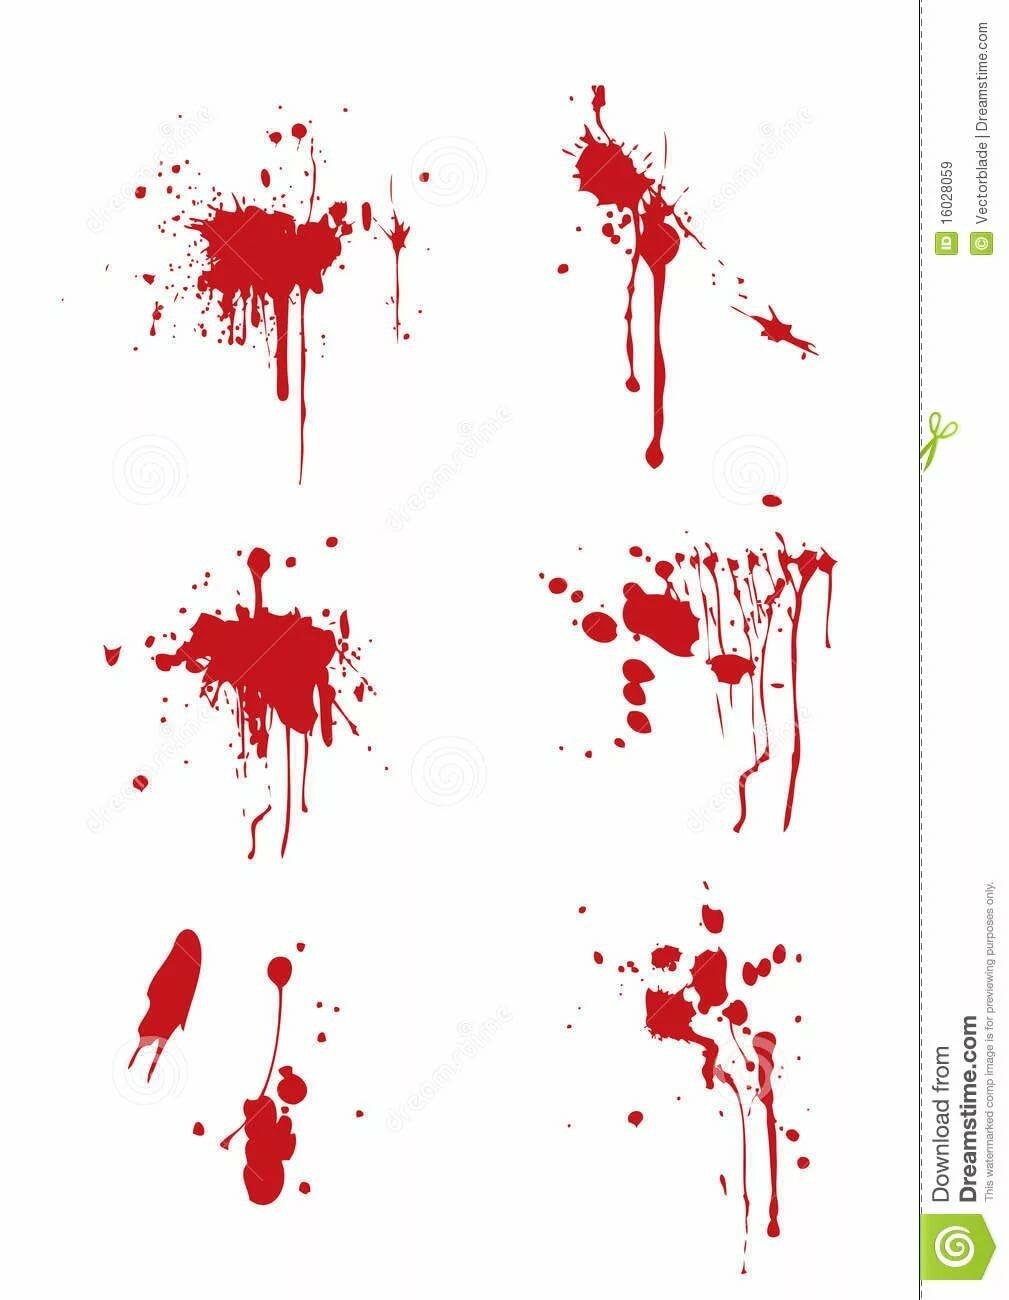 perform blood draw request - HD1009×1300